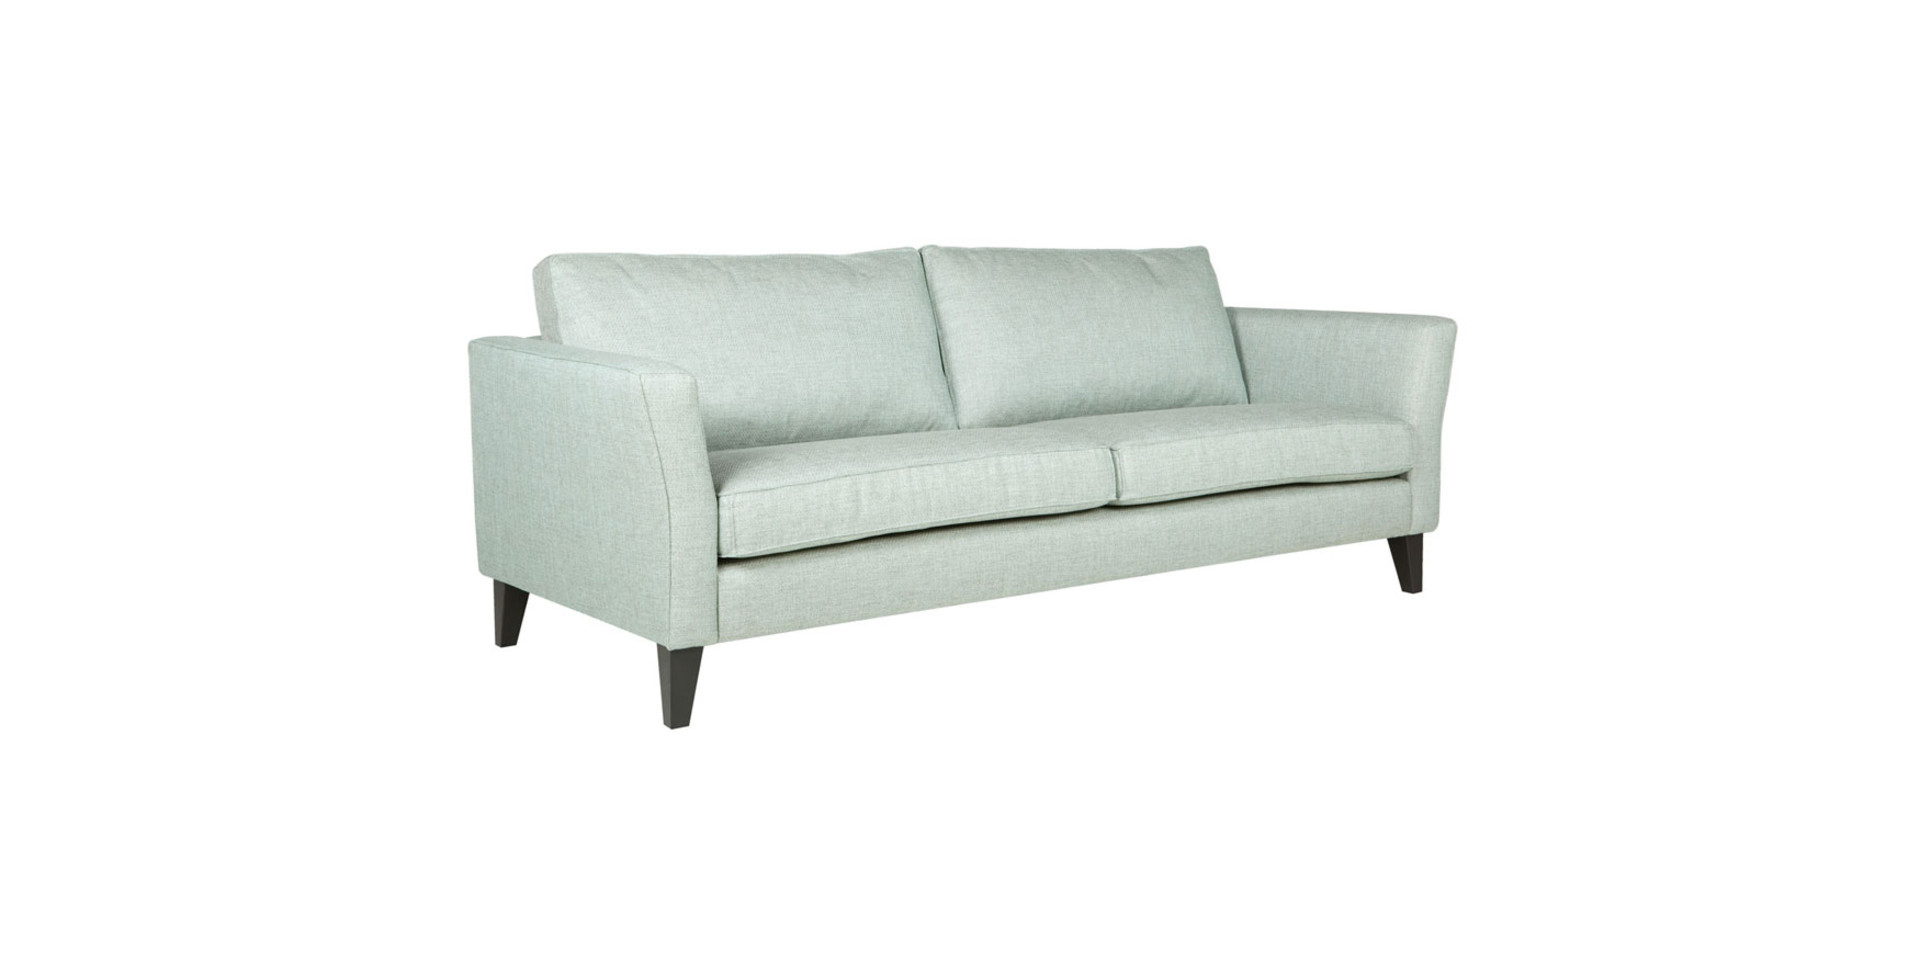 sits-caprice-canape-3seater_himalaya7_green_2